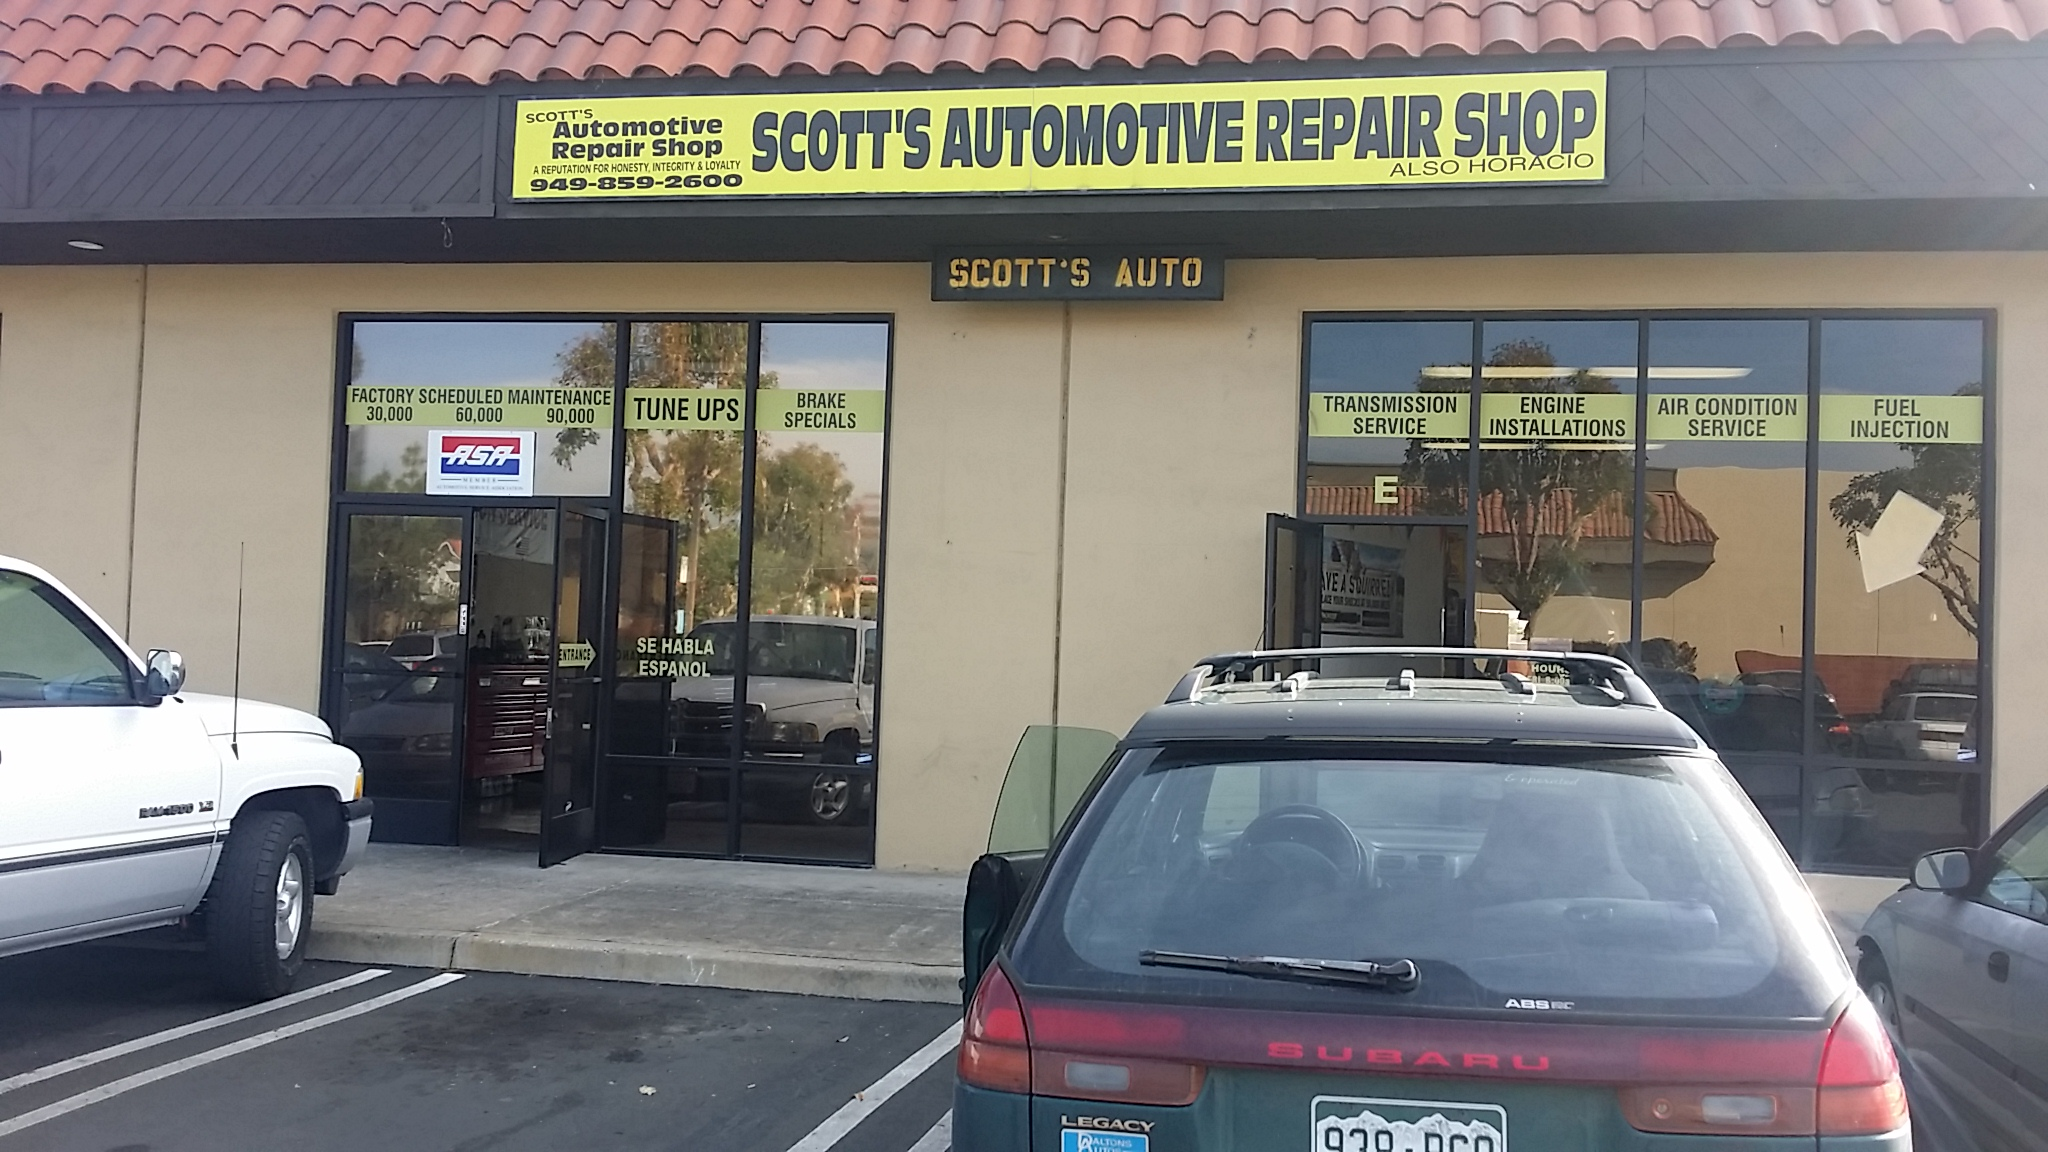 Scott's Automotive Repair Shop Coupons near me in Lake ...